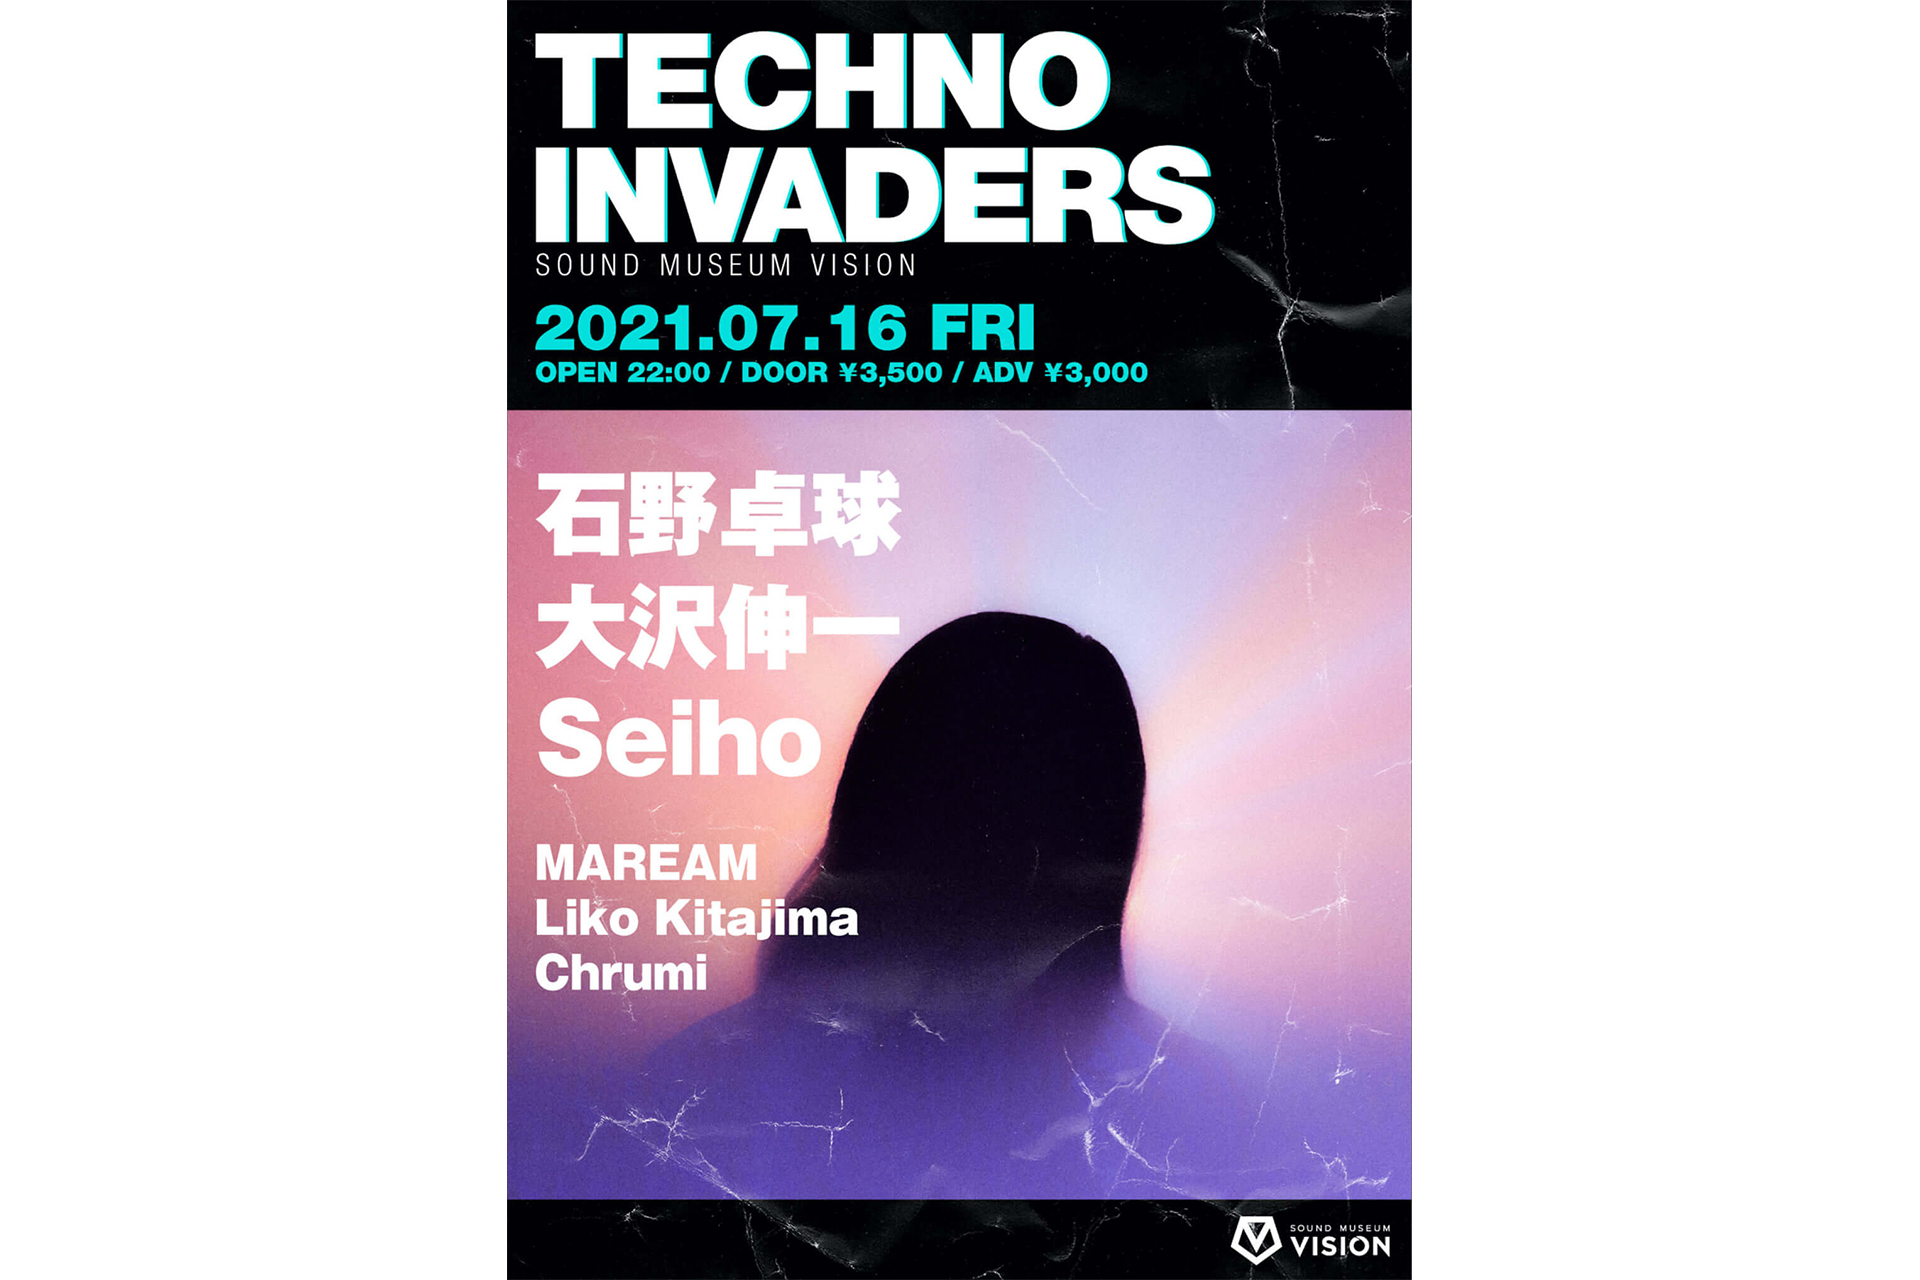 「TECHNO INVADERS」が待望の再開! 石野卓球、大沢伸一、Seihoらが参戦